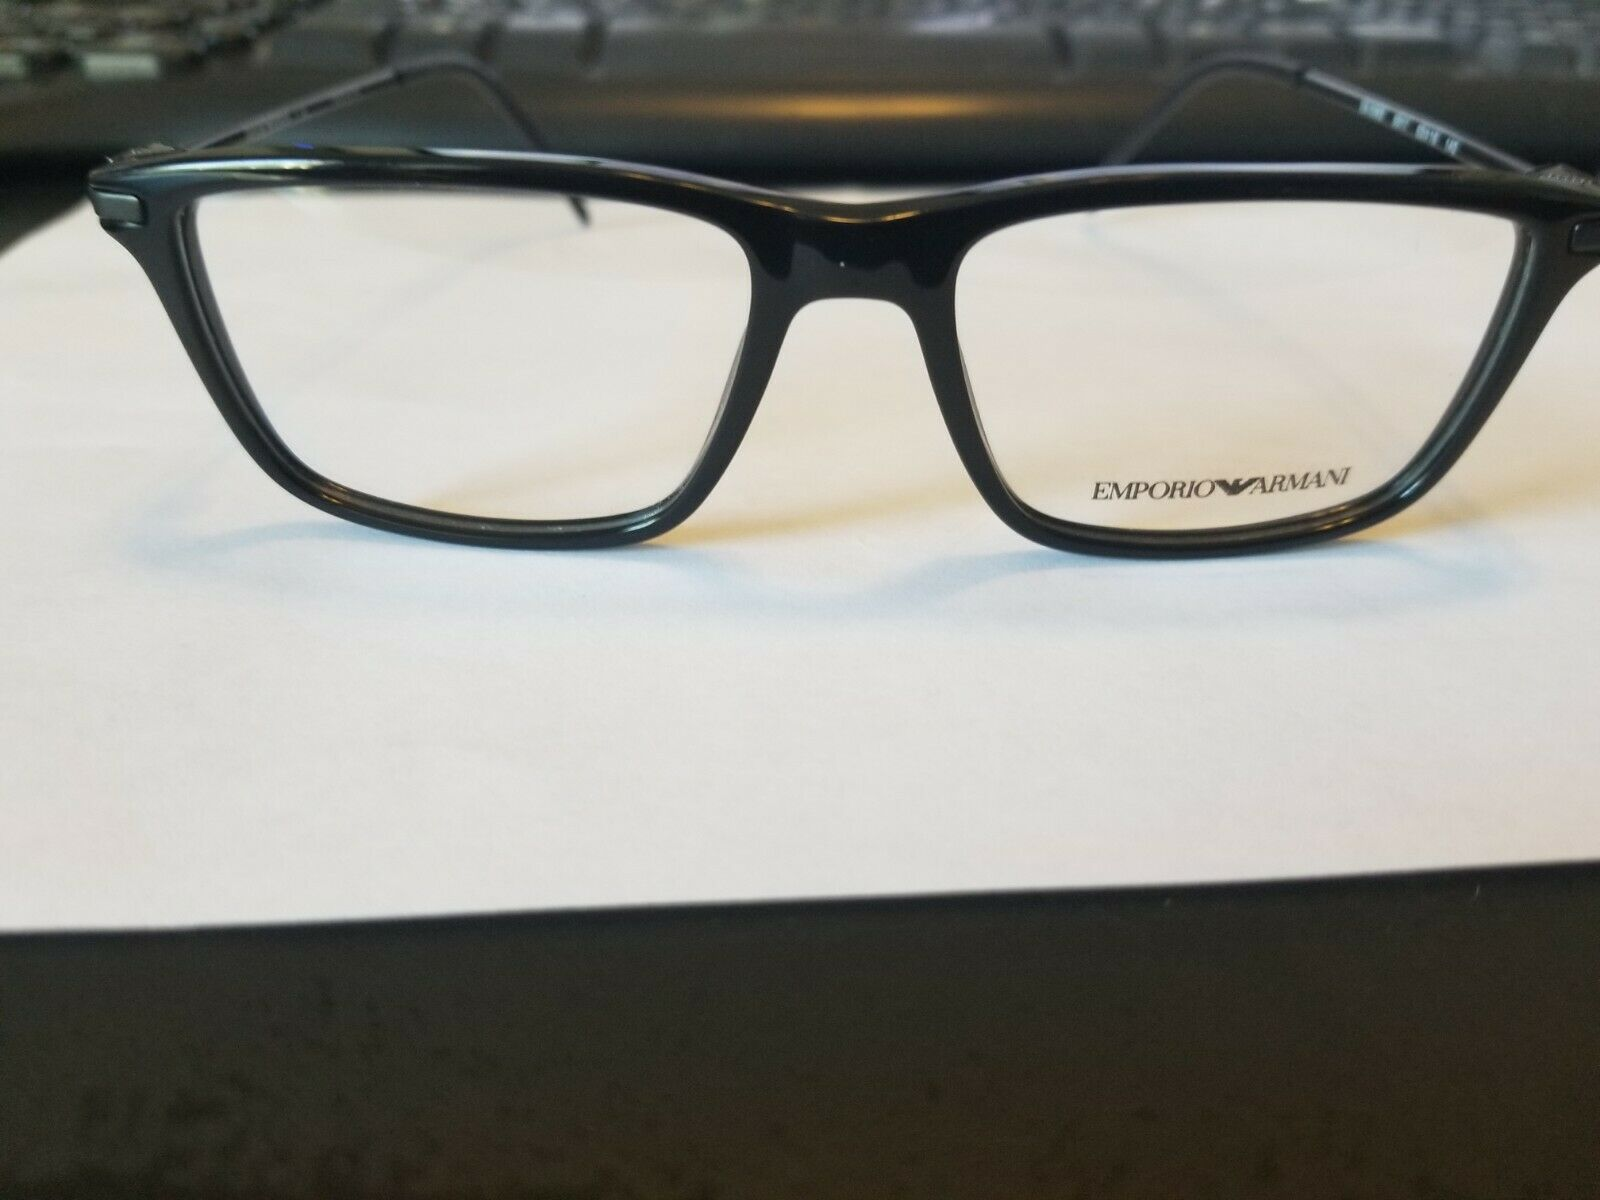 EMPORIO ARMANI EA3063 COLOR 5017 SIZE 53/16/140 RX Eyeglasses Frame..BRAND NEW